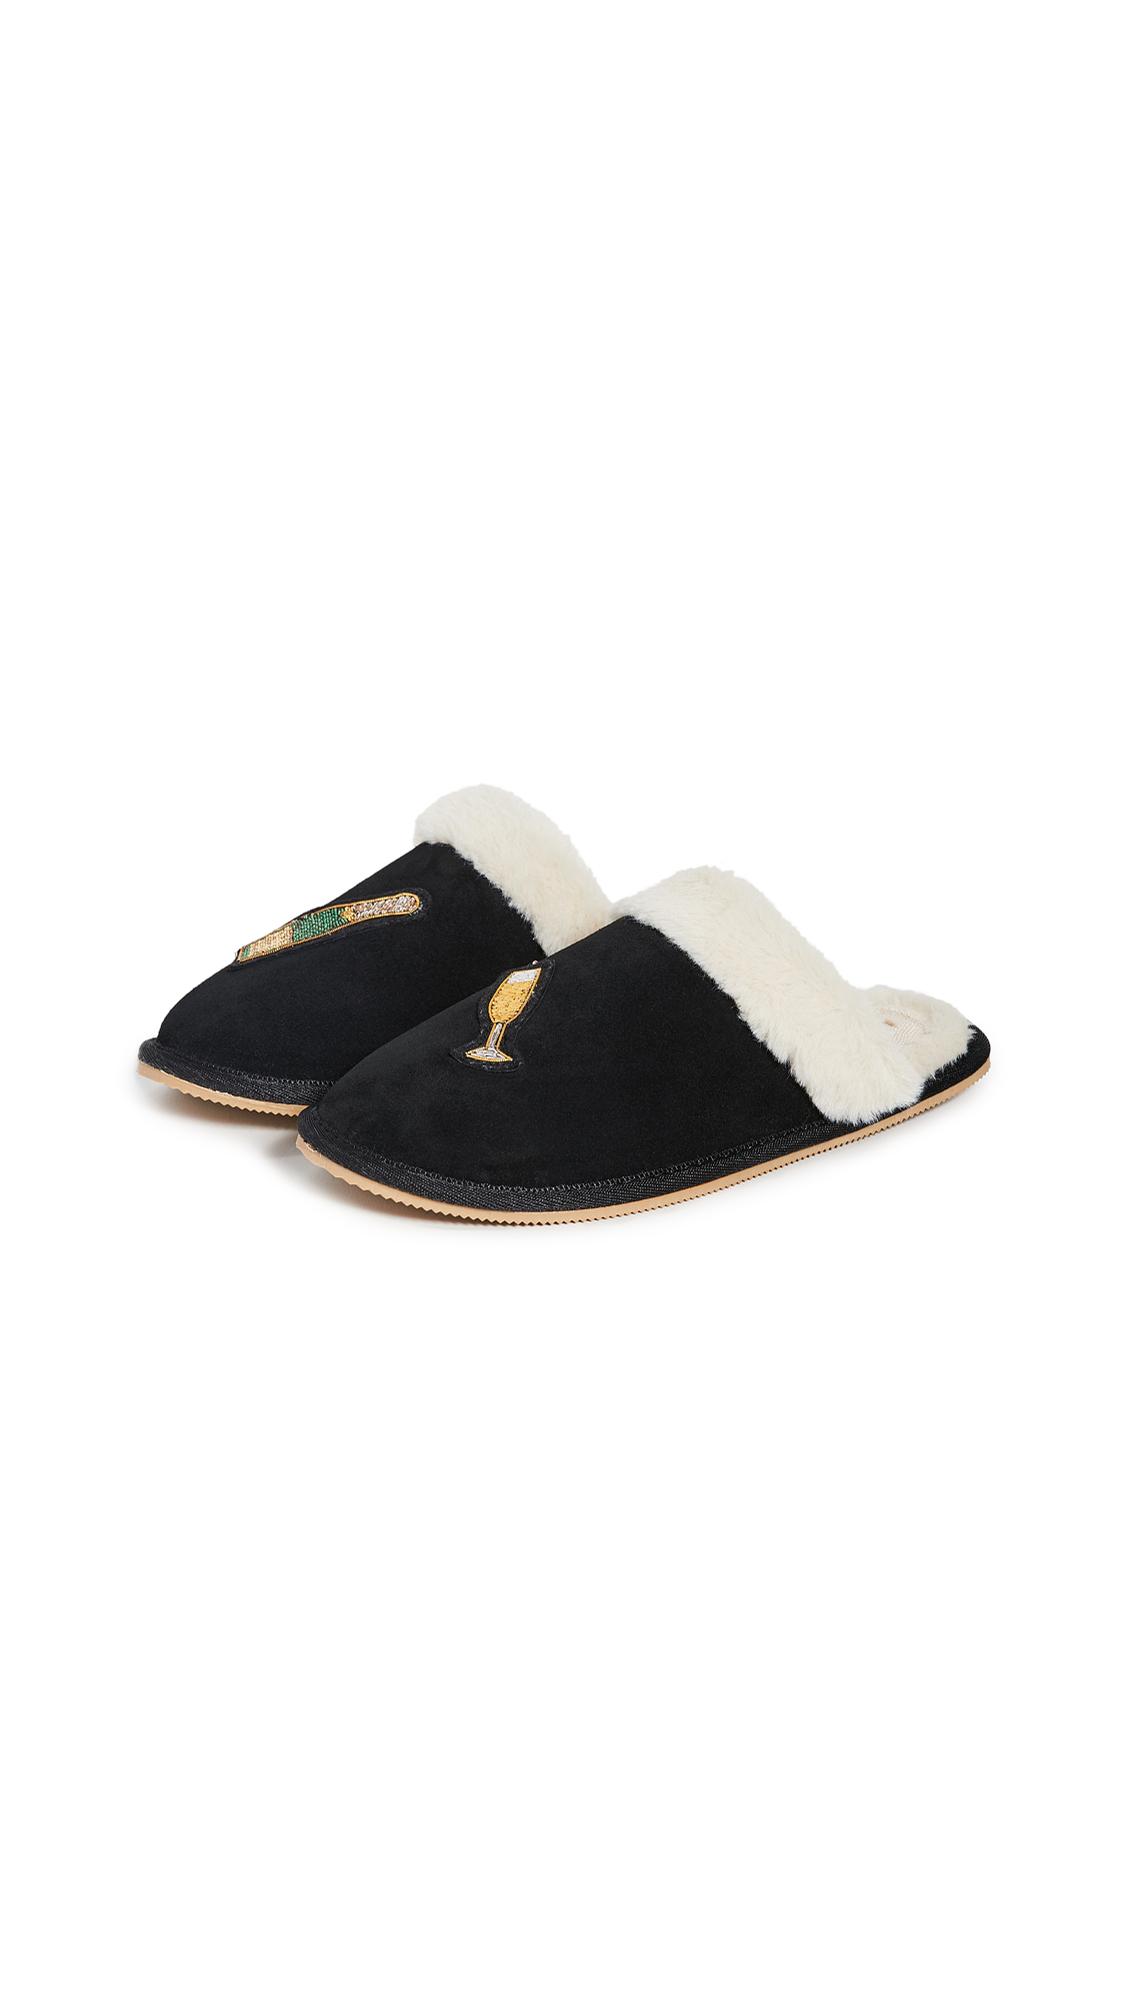 Buy Soludos Cheers Cozy Slippers online, shop Soludos